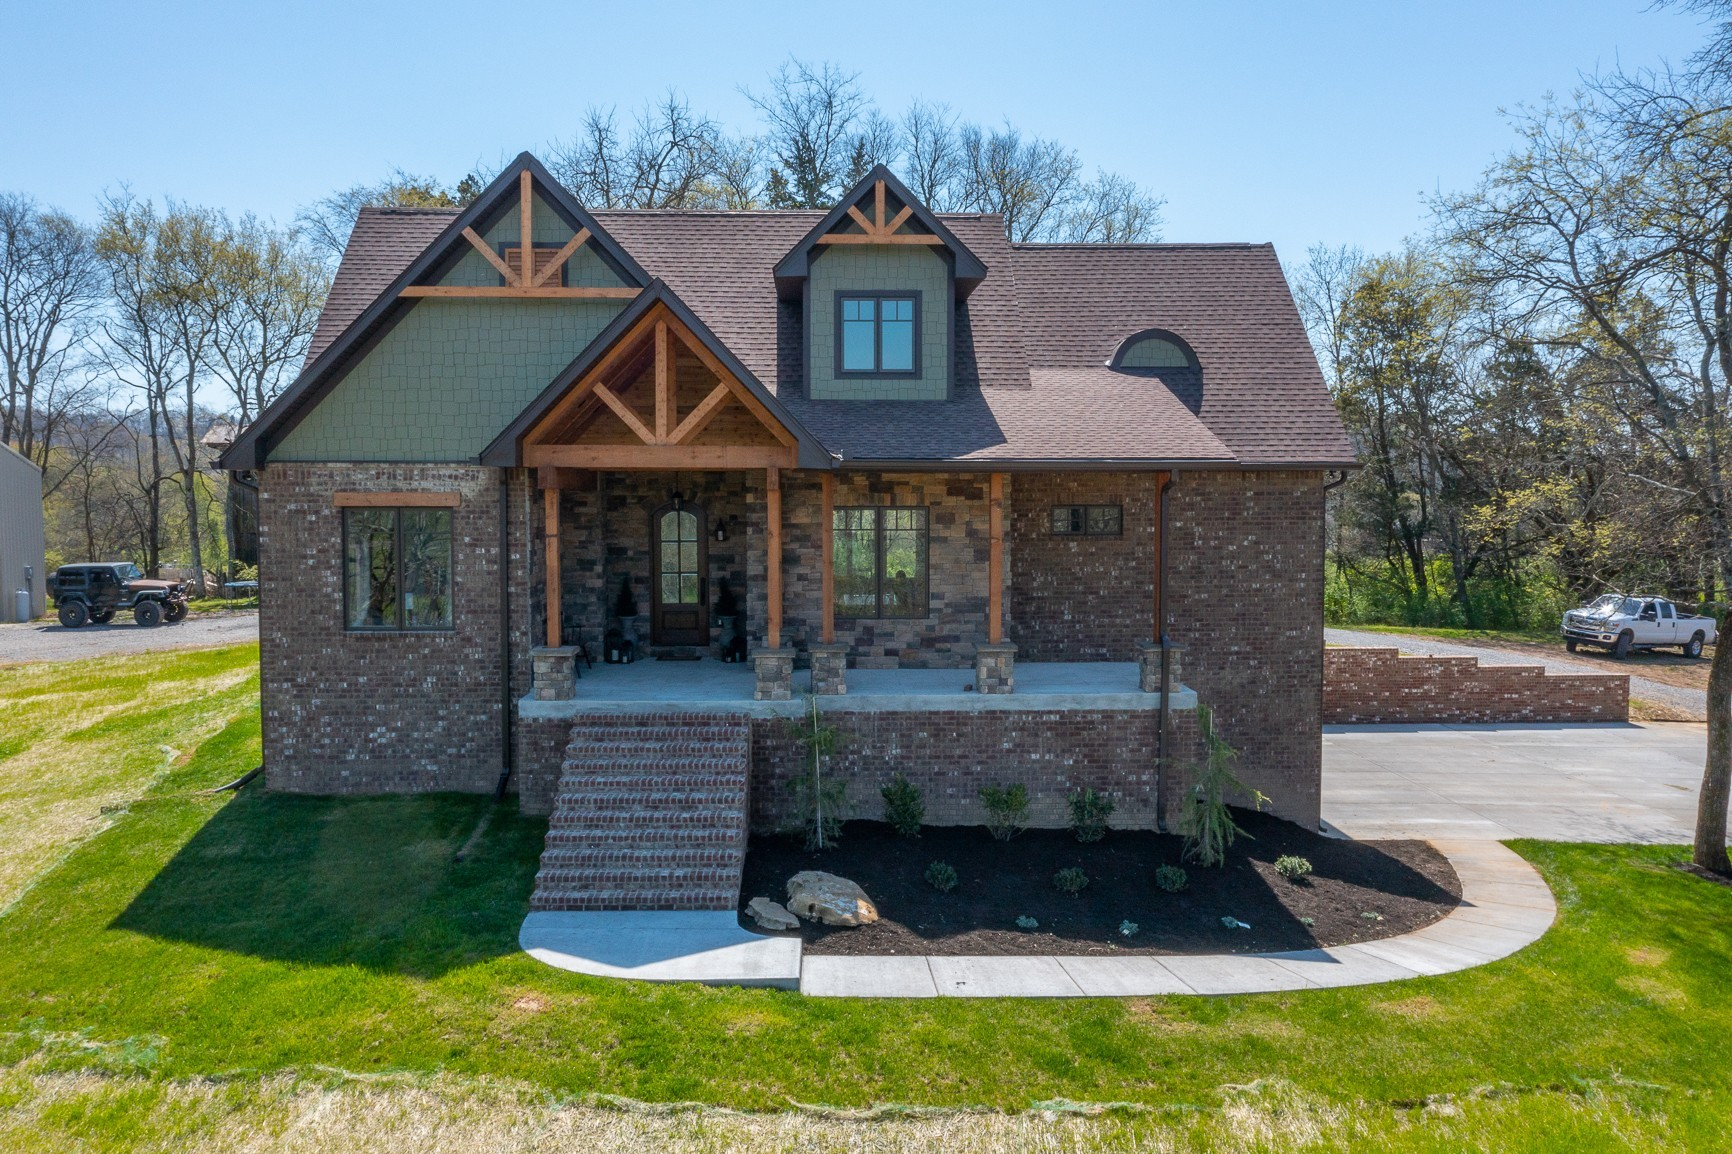 915A Dobbins Pike Property Photo - Gallatin, TN real estate listing